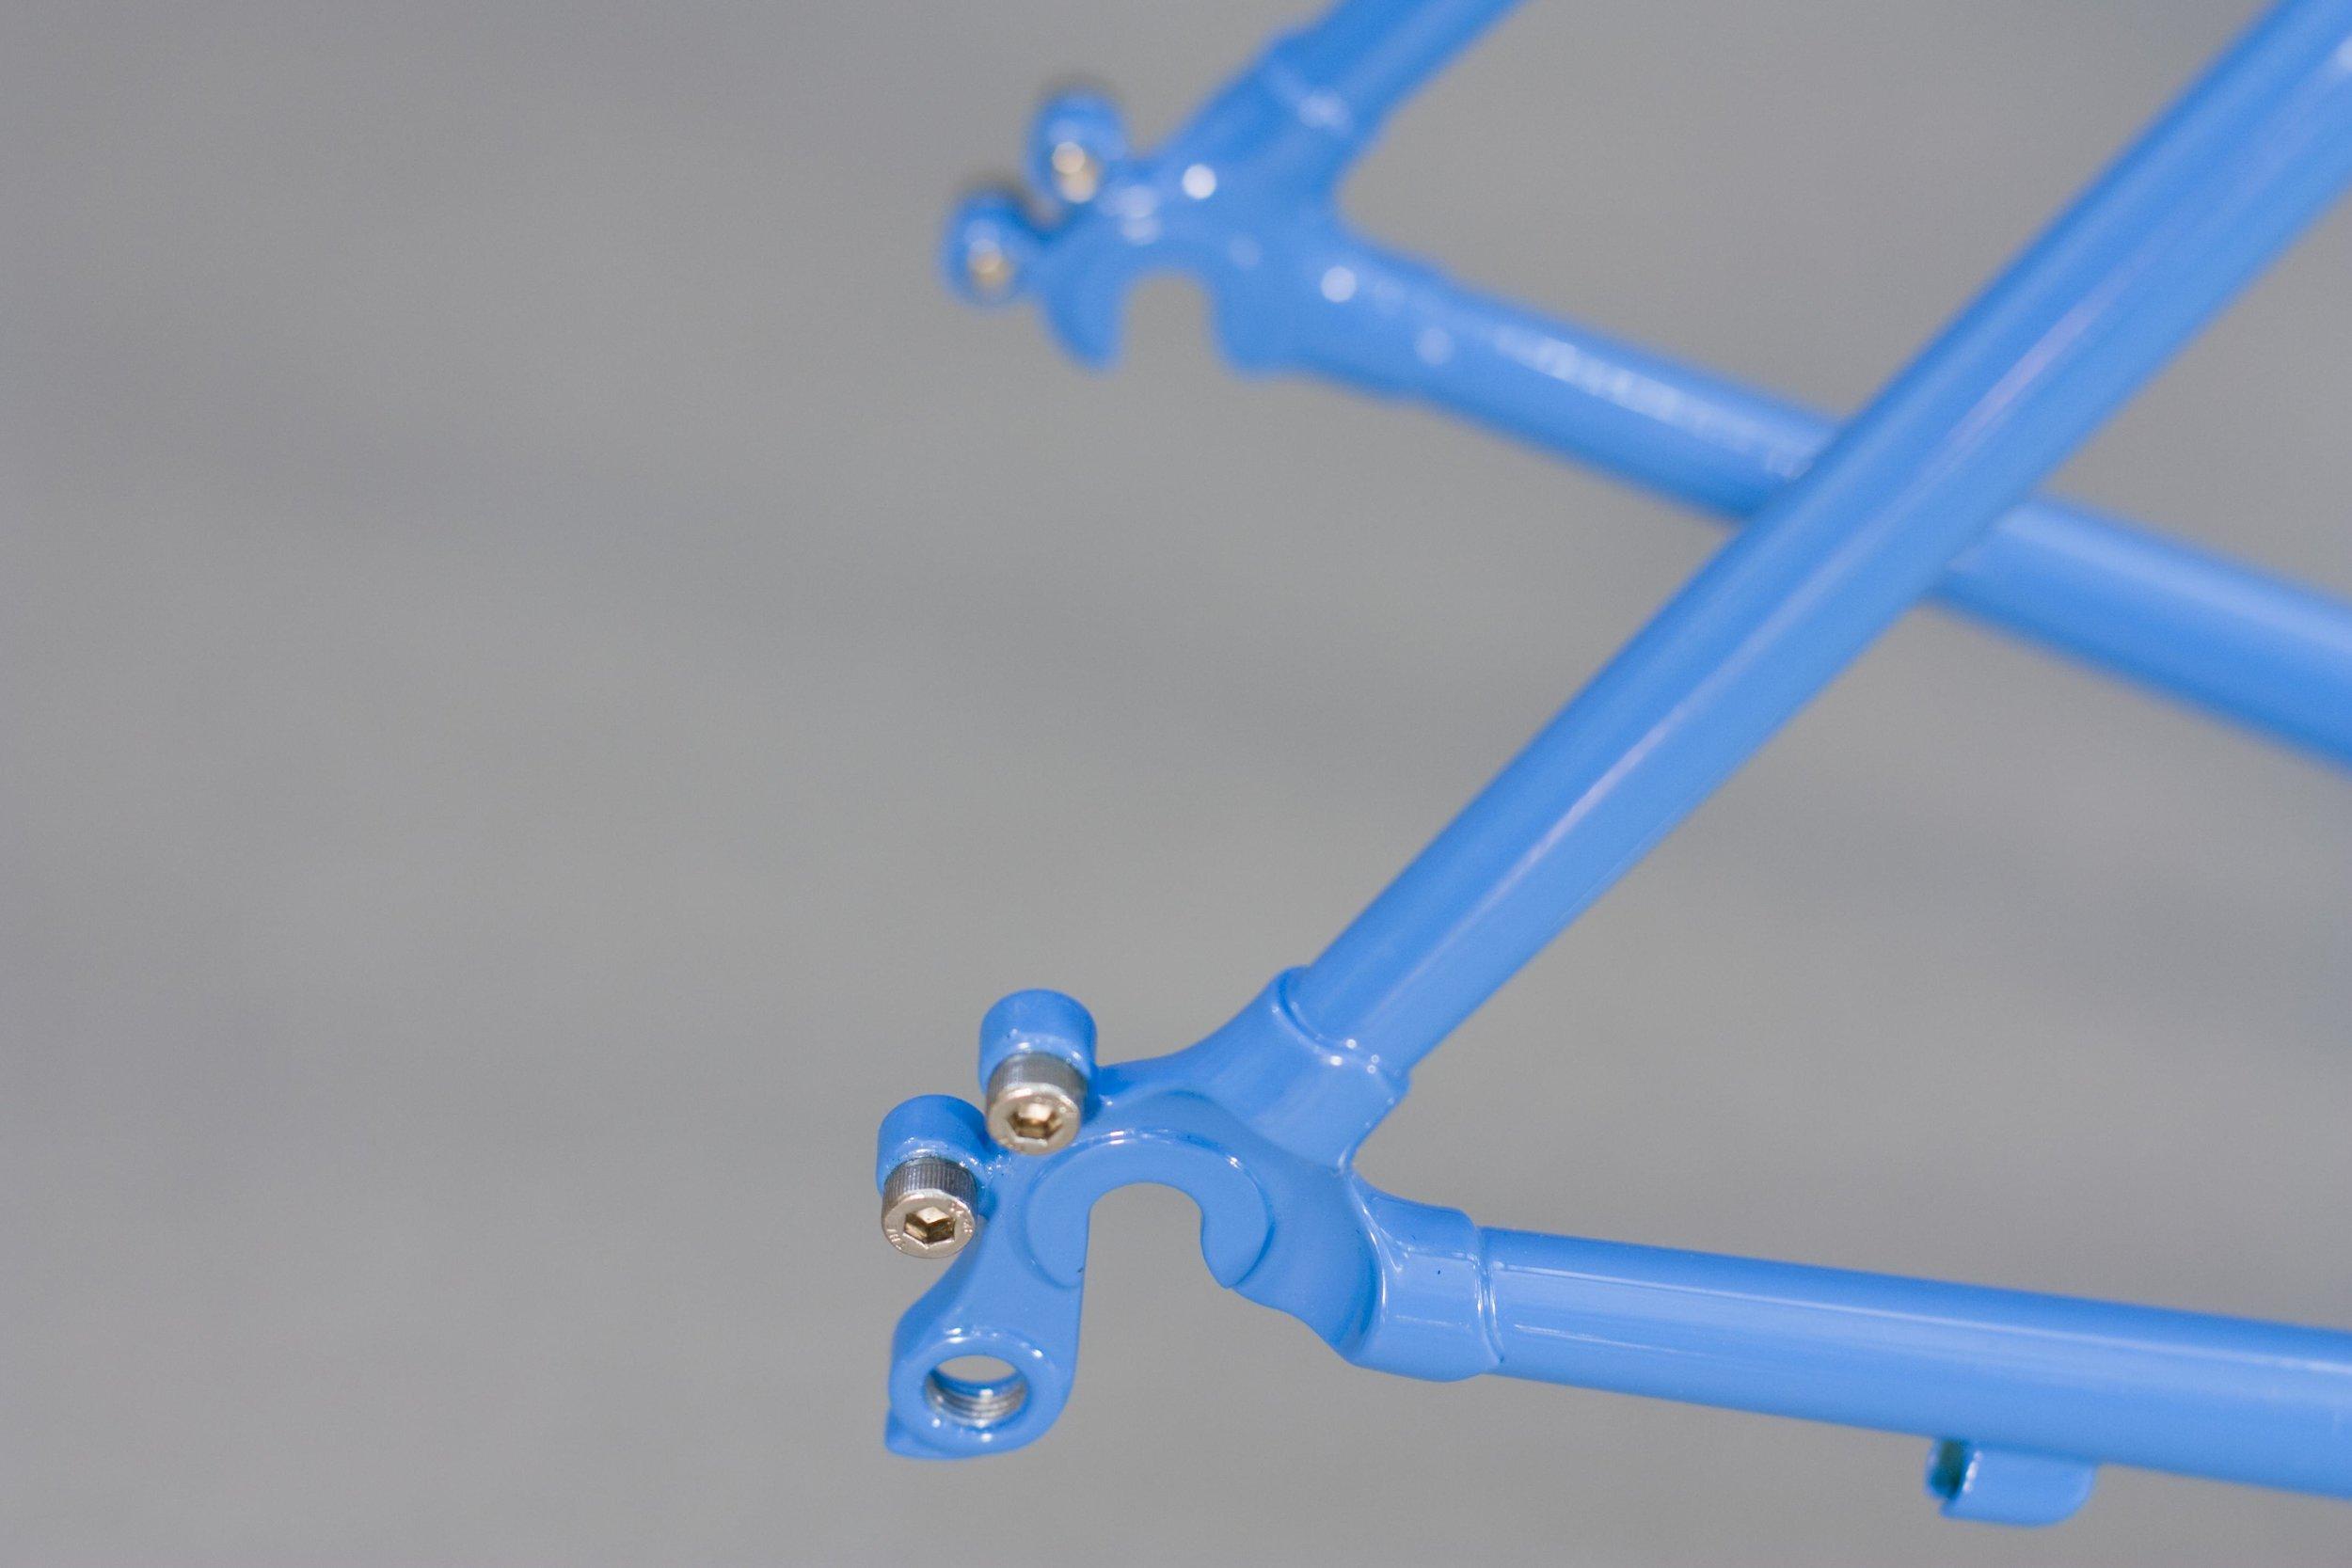 56cm-winter-bicycles-built-pelican_8269877249_o.jpg